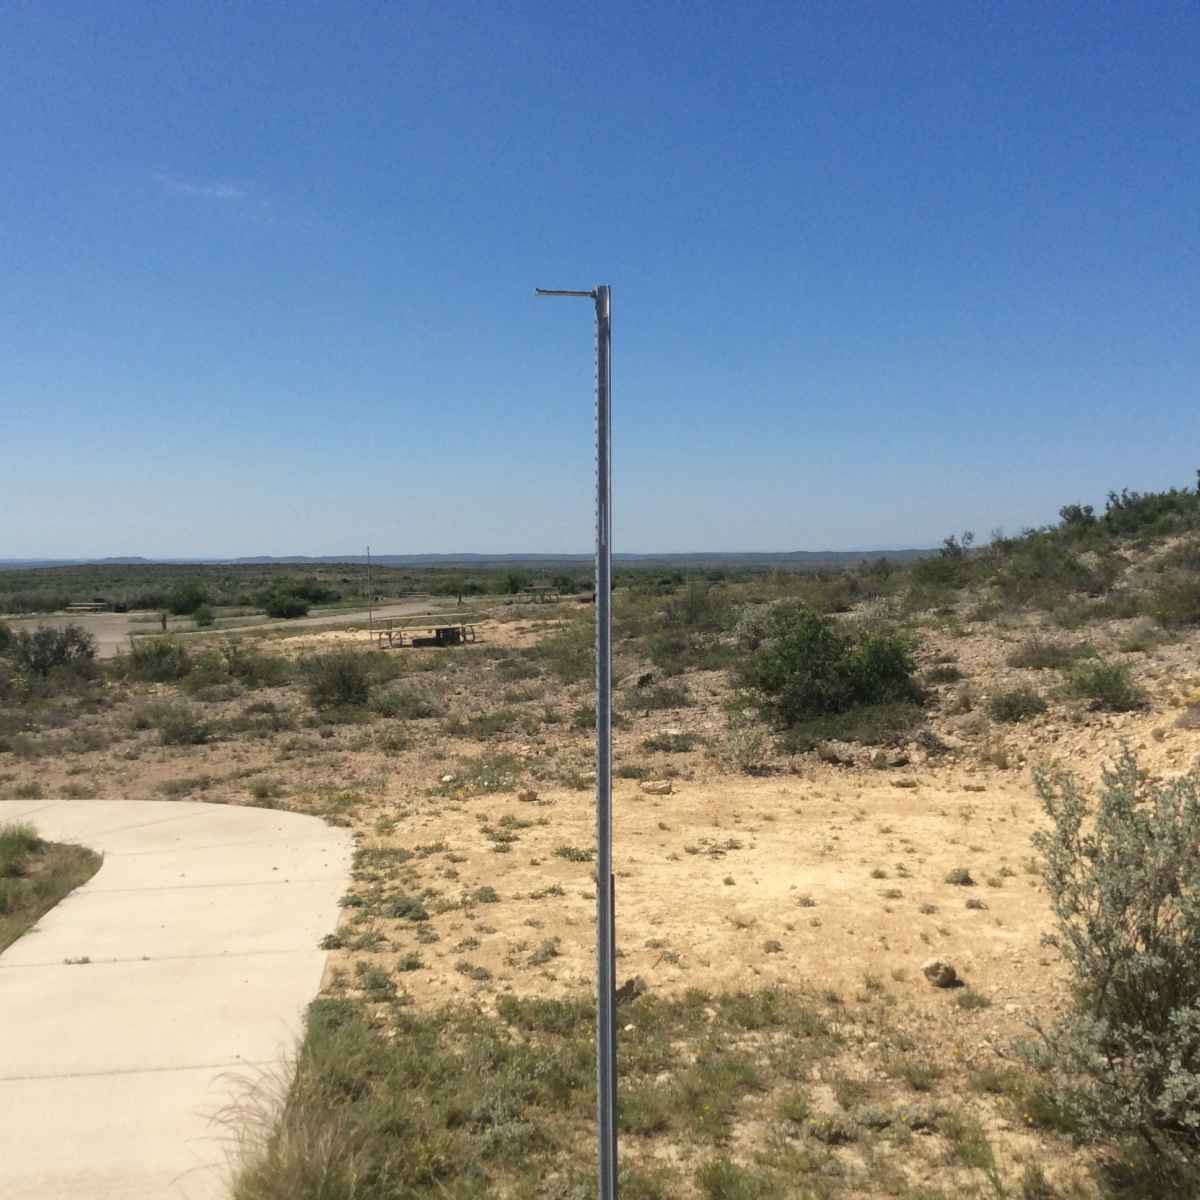 The lantern post at Campsite 35/